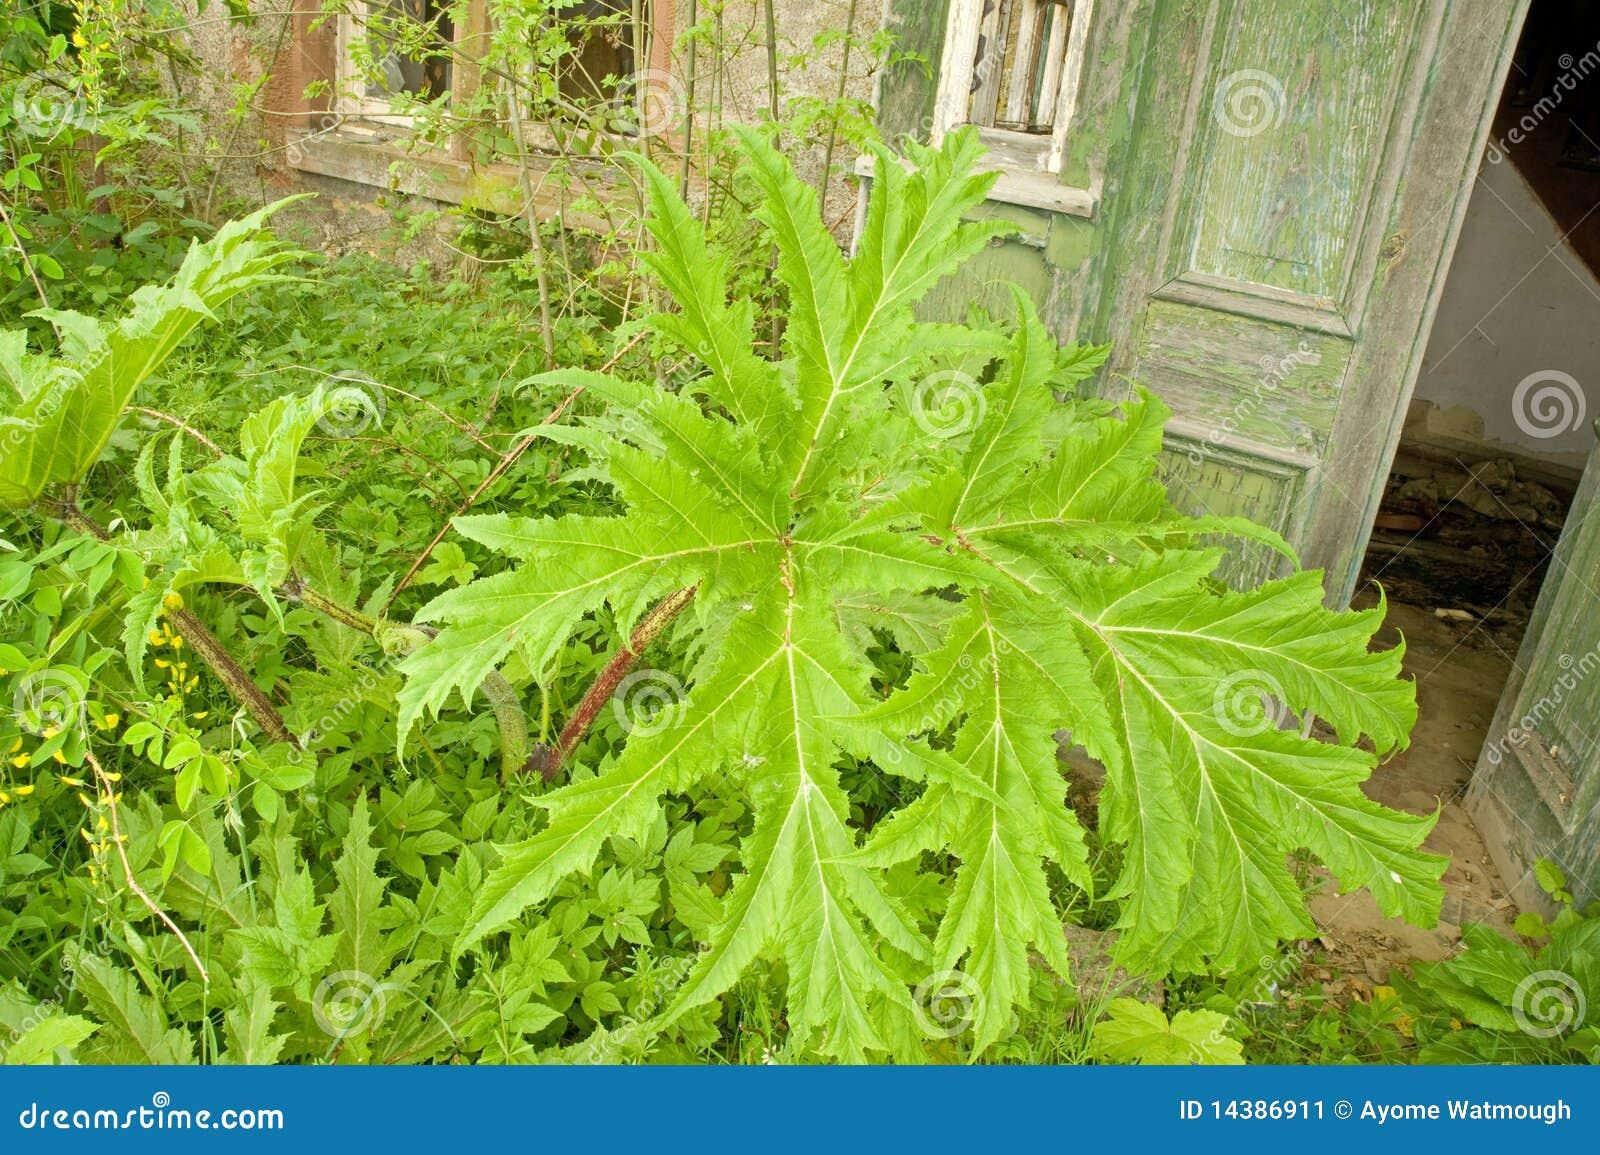 Giant hogweed.